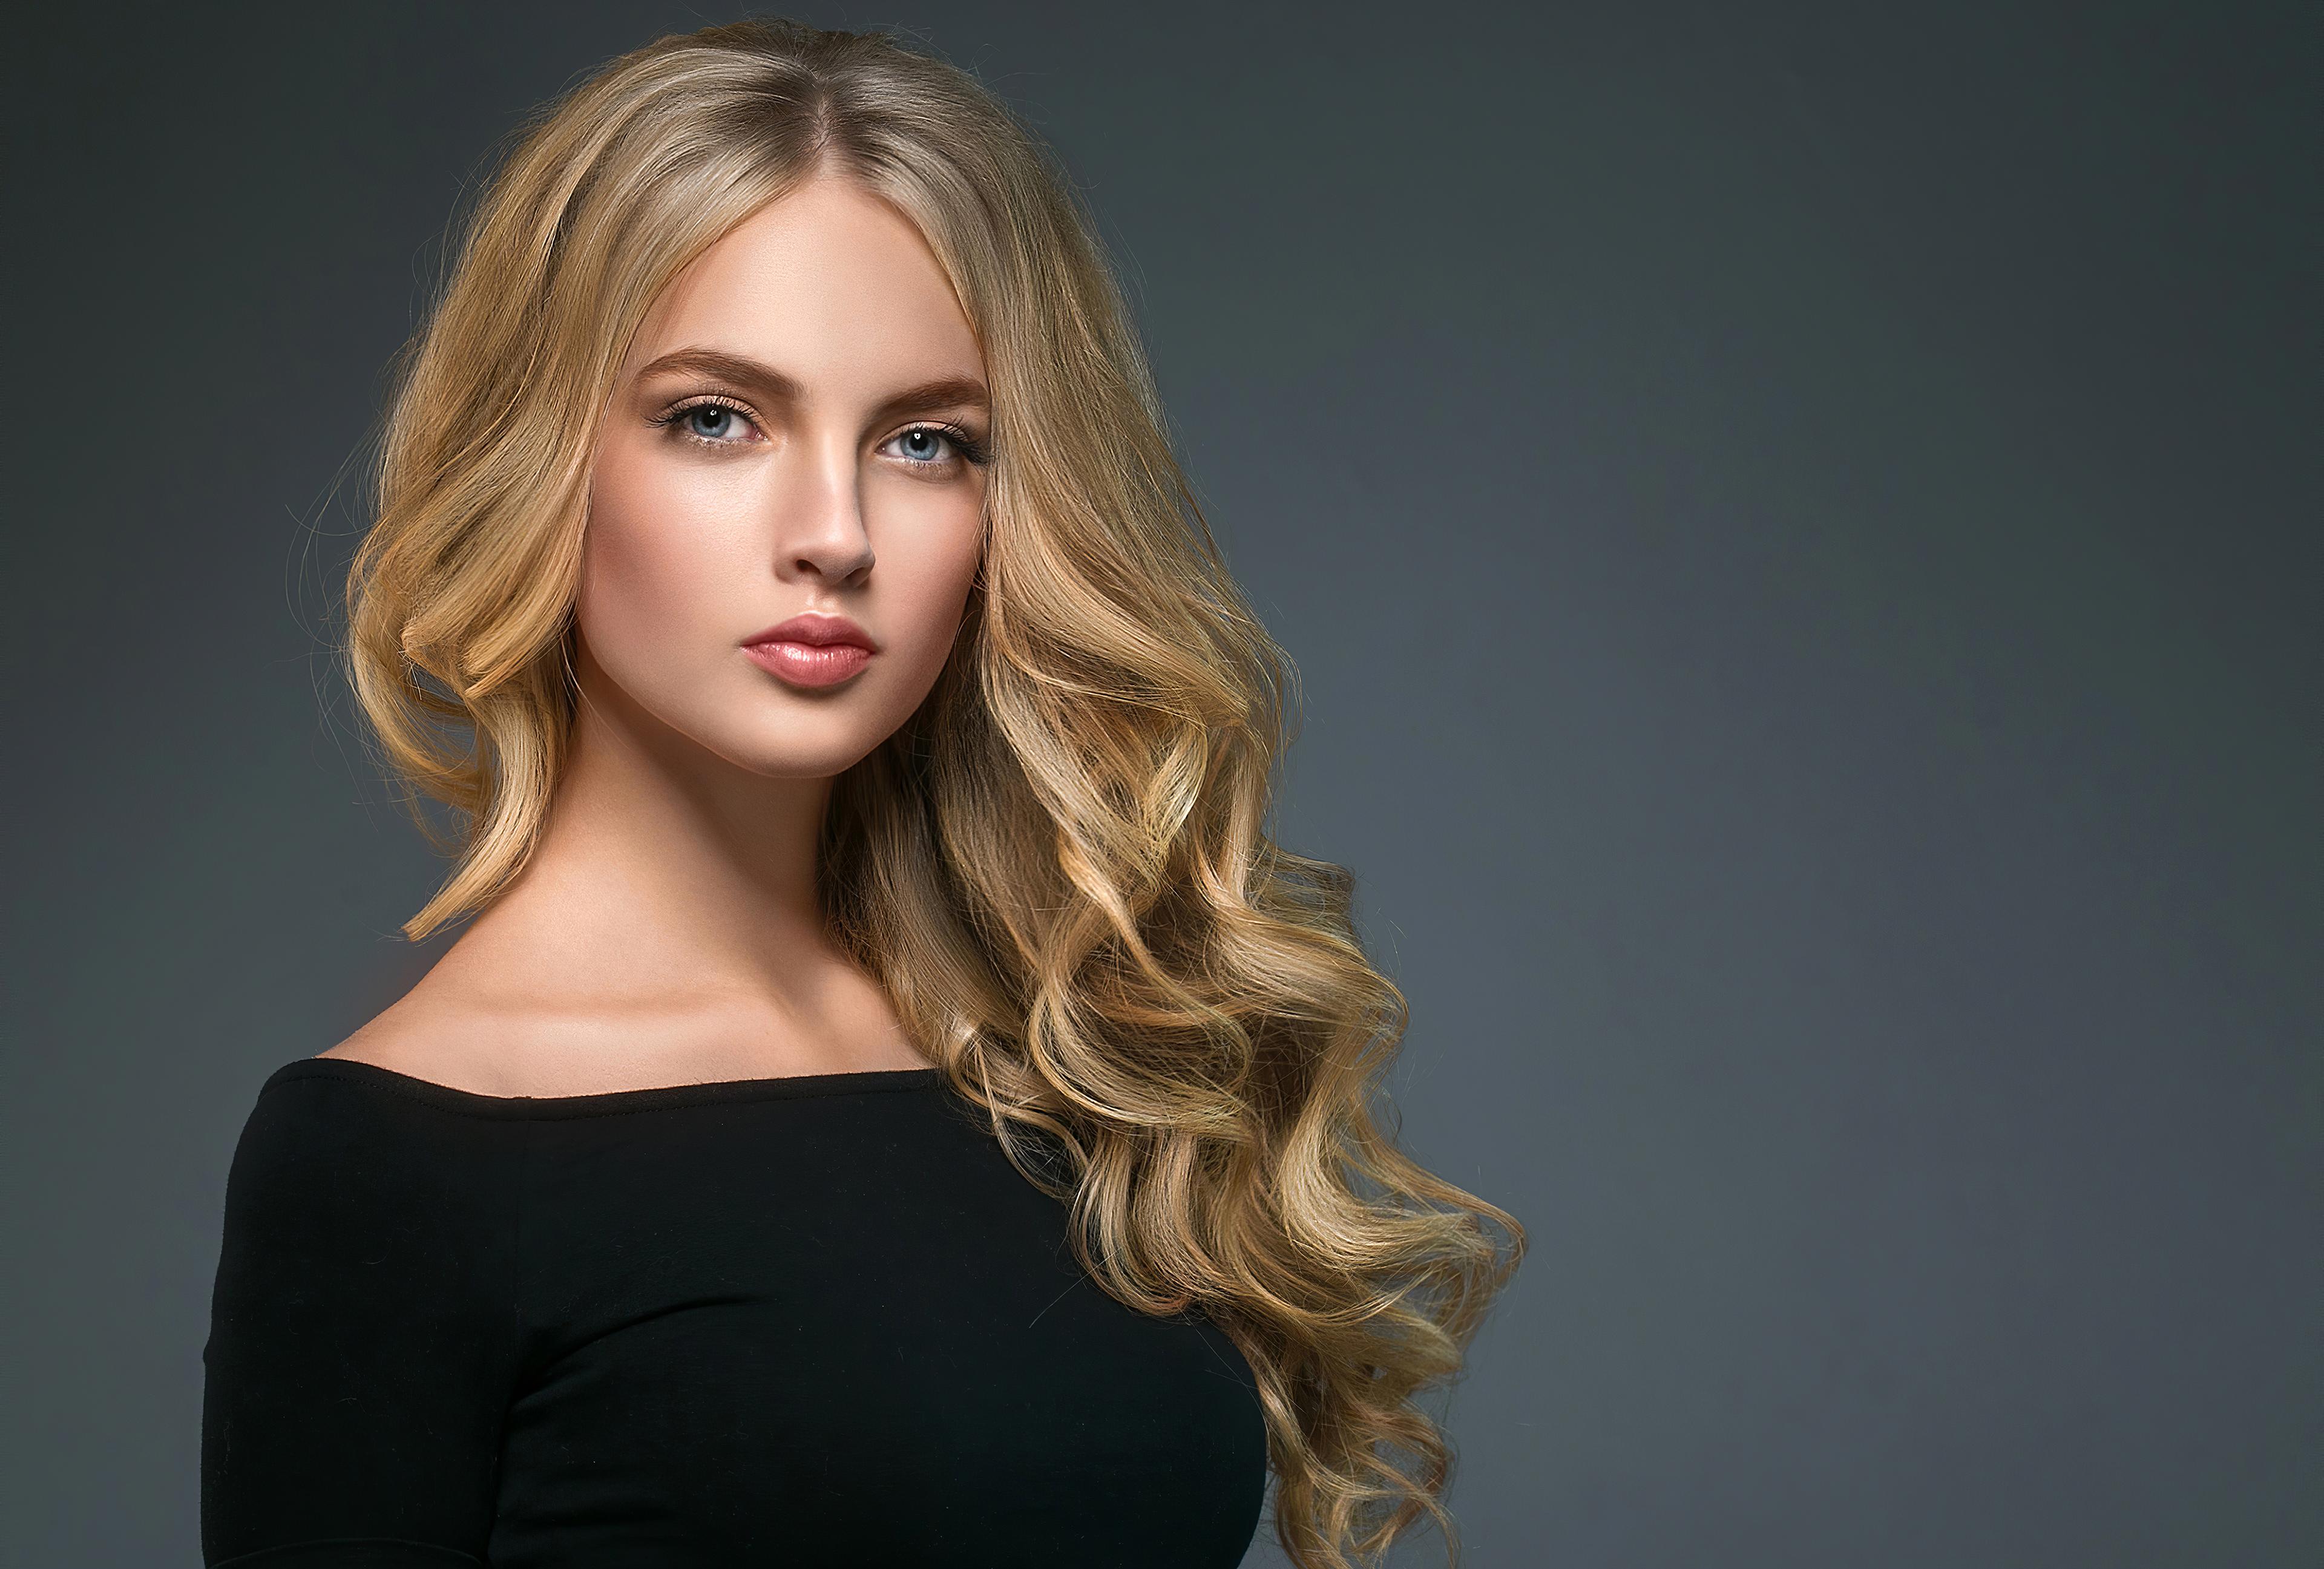 girl blonde hair glance 1575665943 - Girl Blonde Hair Glance -